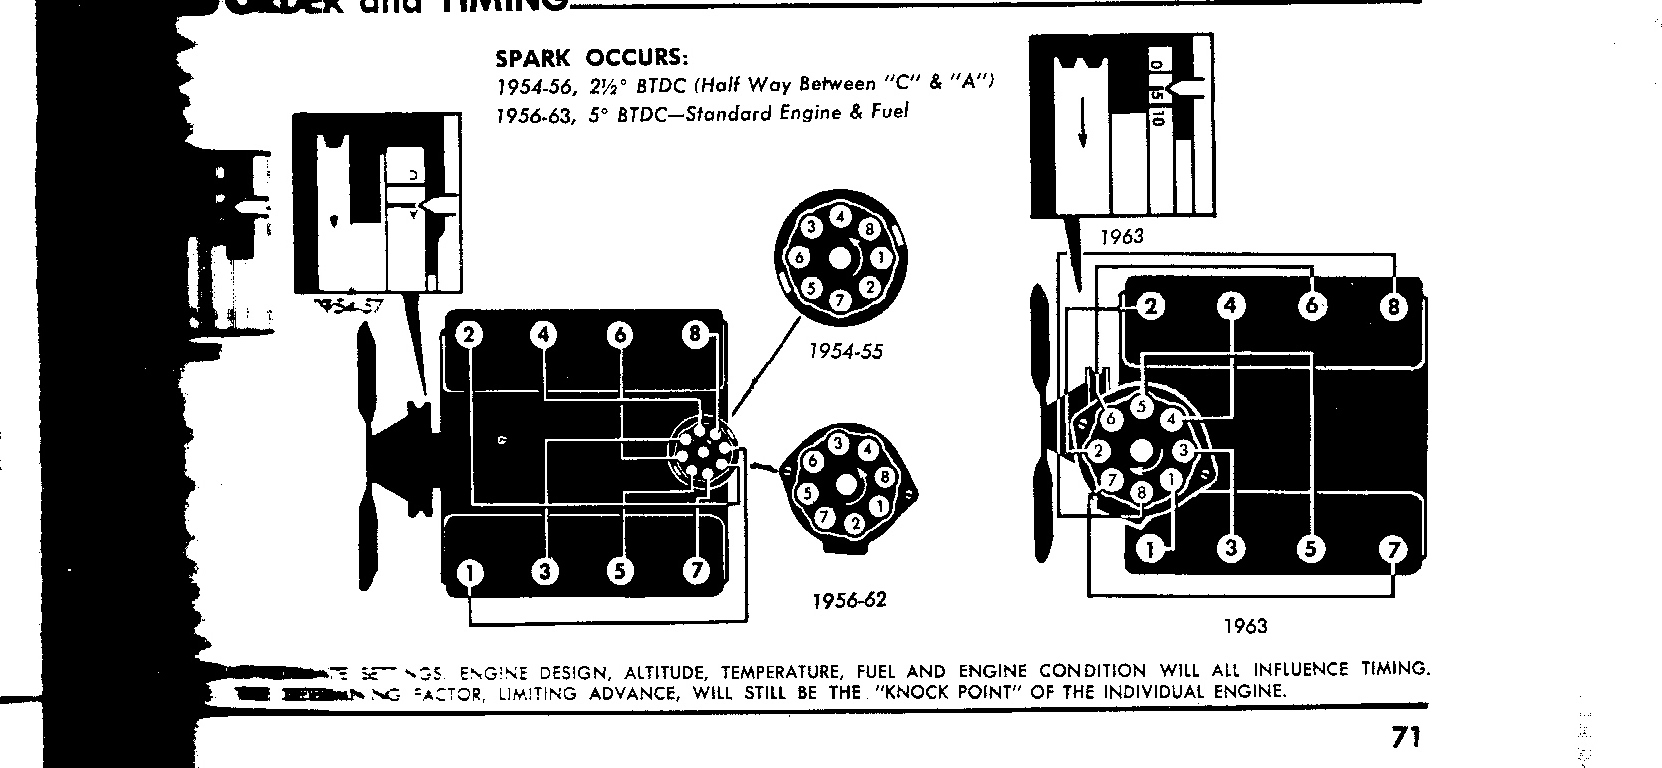 1963 cadillac spark plug wire diagram - makita switch wiring diagram -  goldwings.kankubuktikan.jeanjaures37.fr  wiring diagram resource